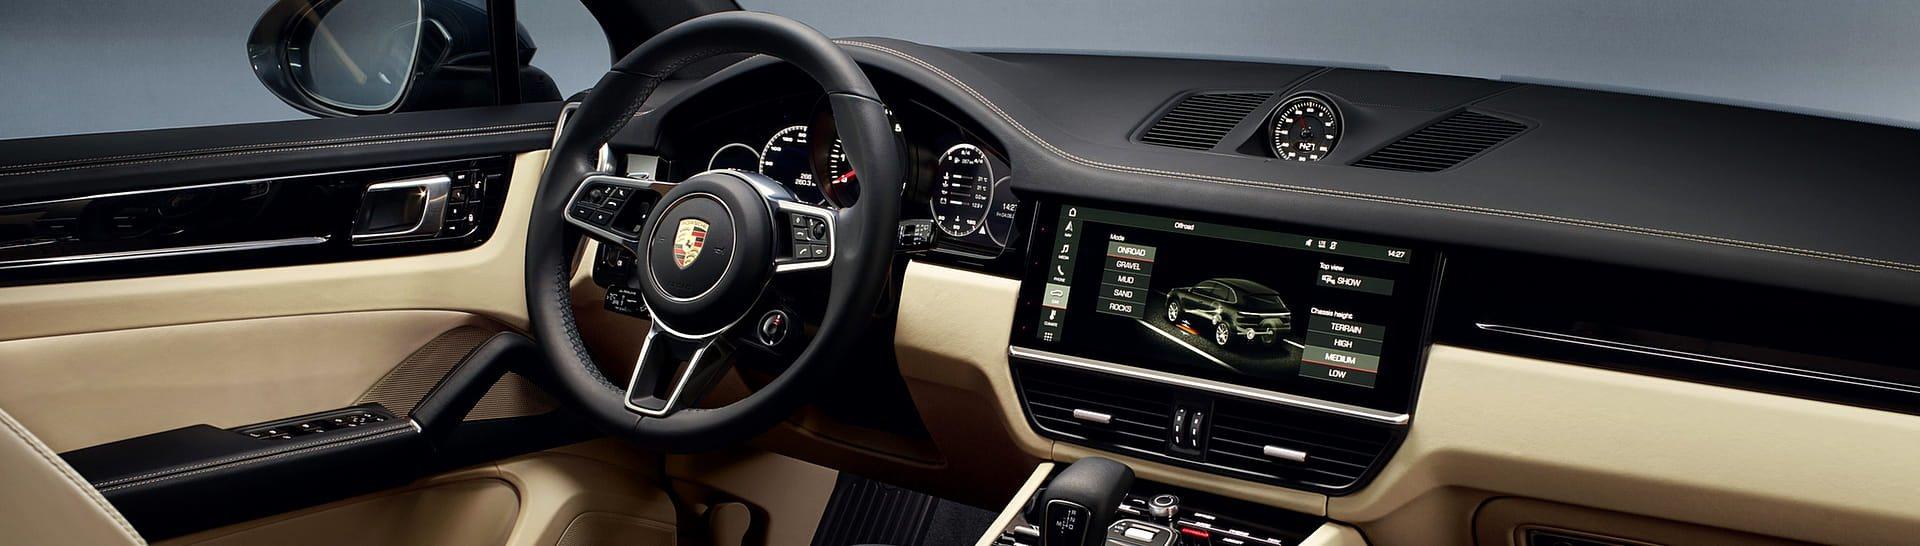 Telecamera 360 gradi Surround View Porsche Cayenne